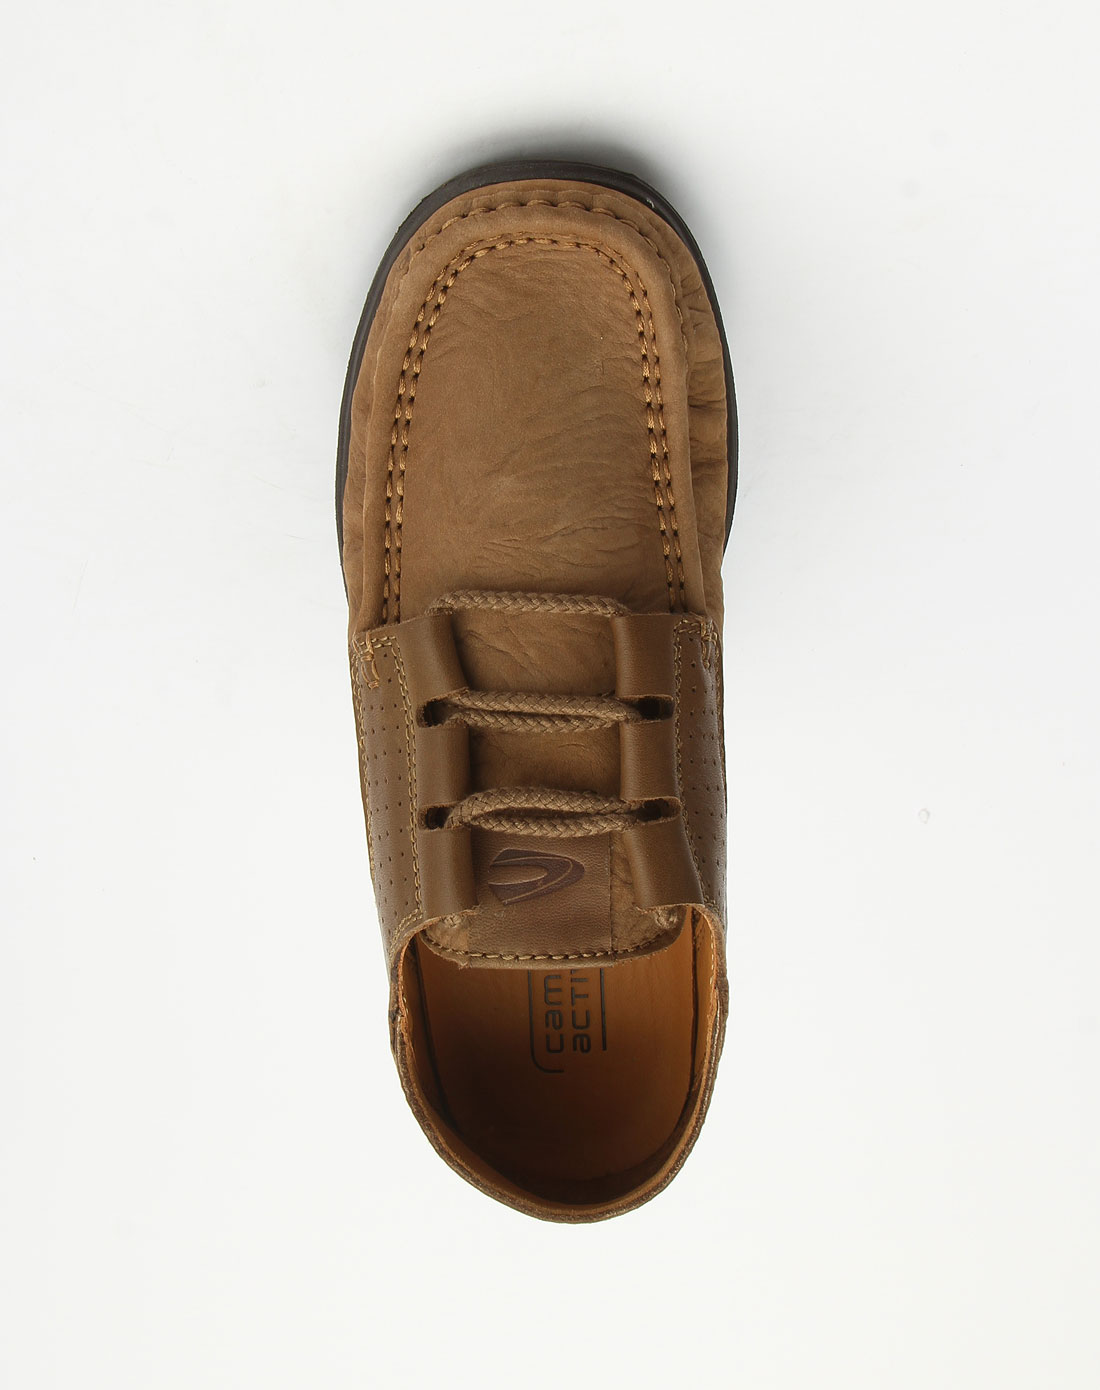 active男款浅棕色绑带休闲鞋10110110